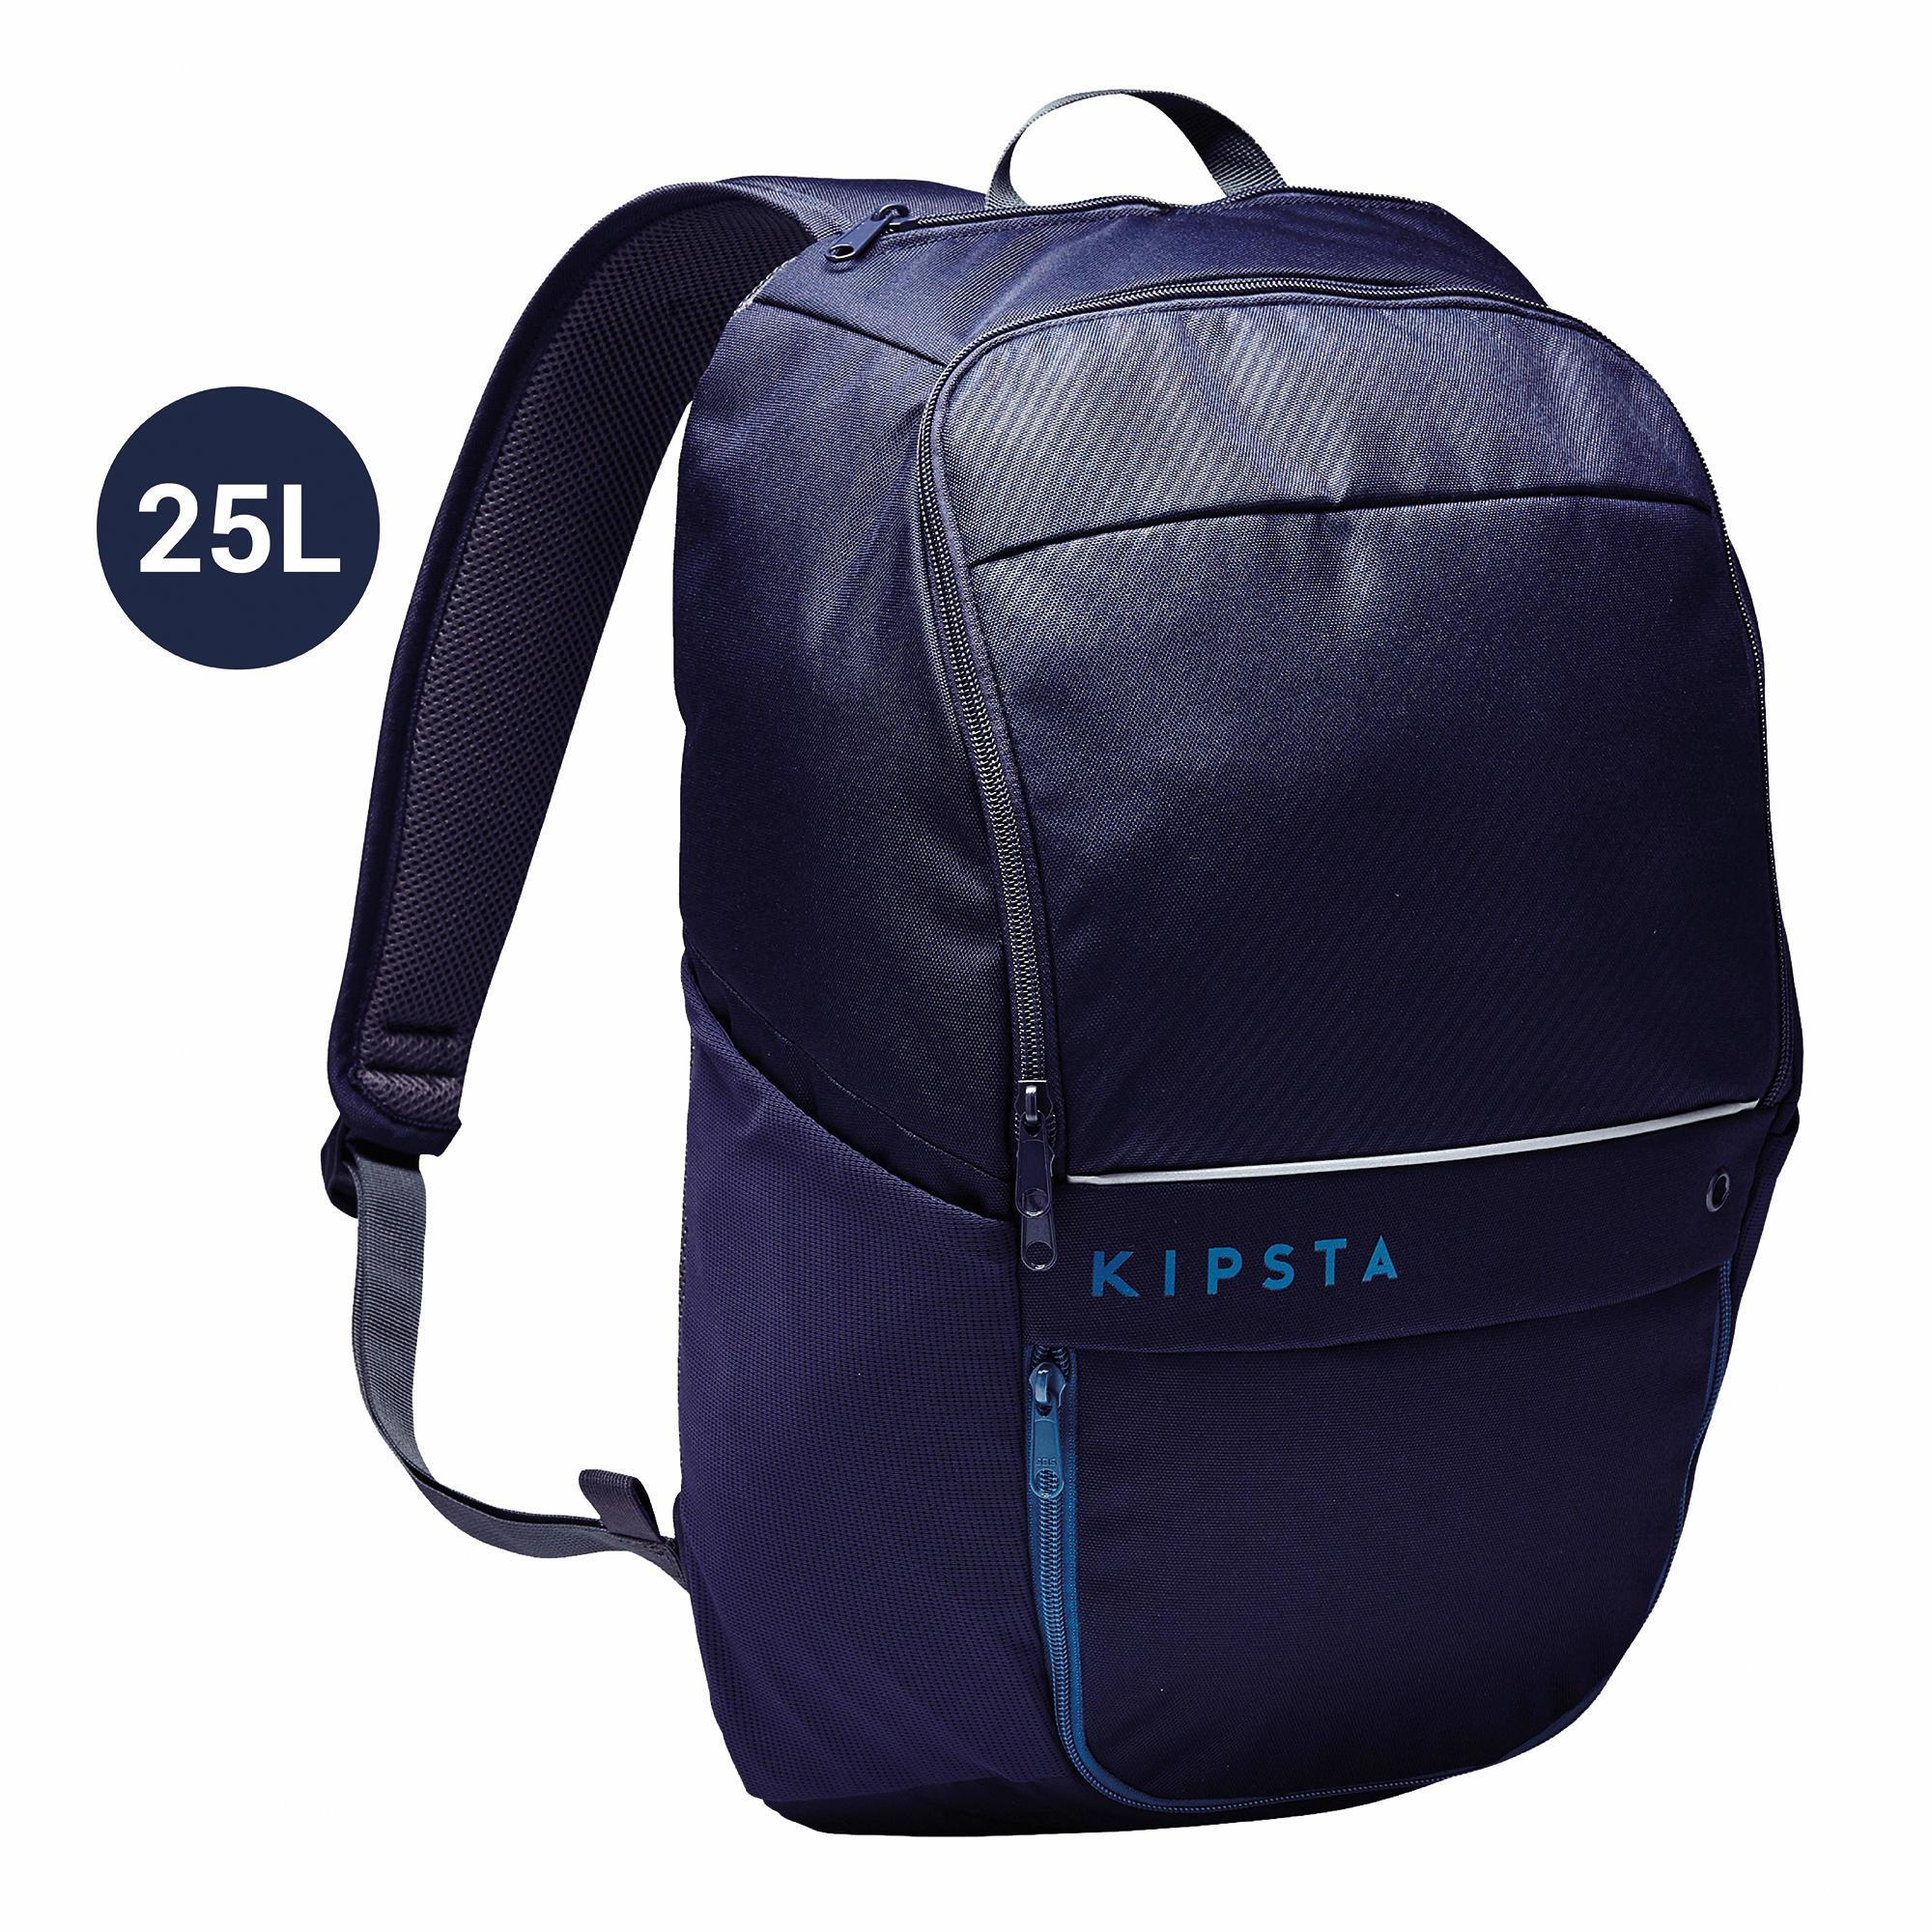 Kipsta Rugzak Classic 25 liter blauw